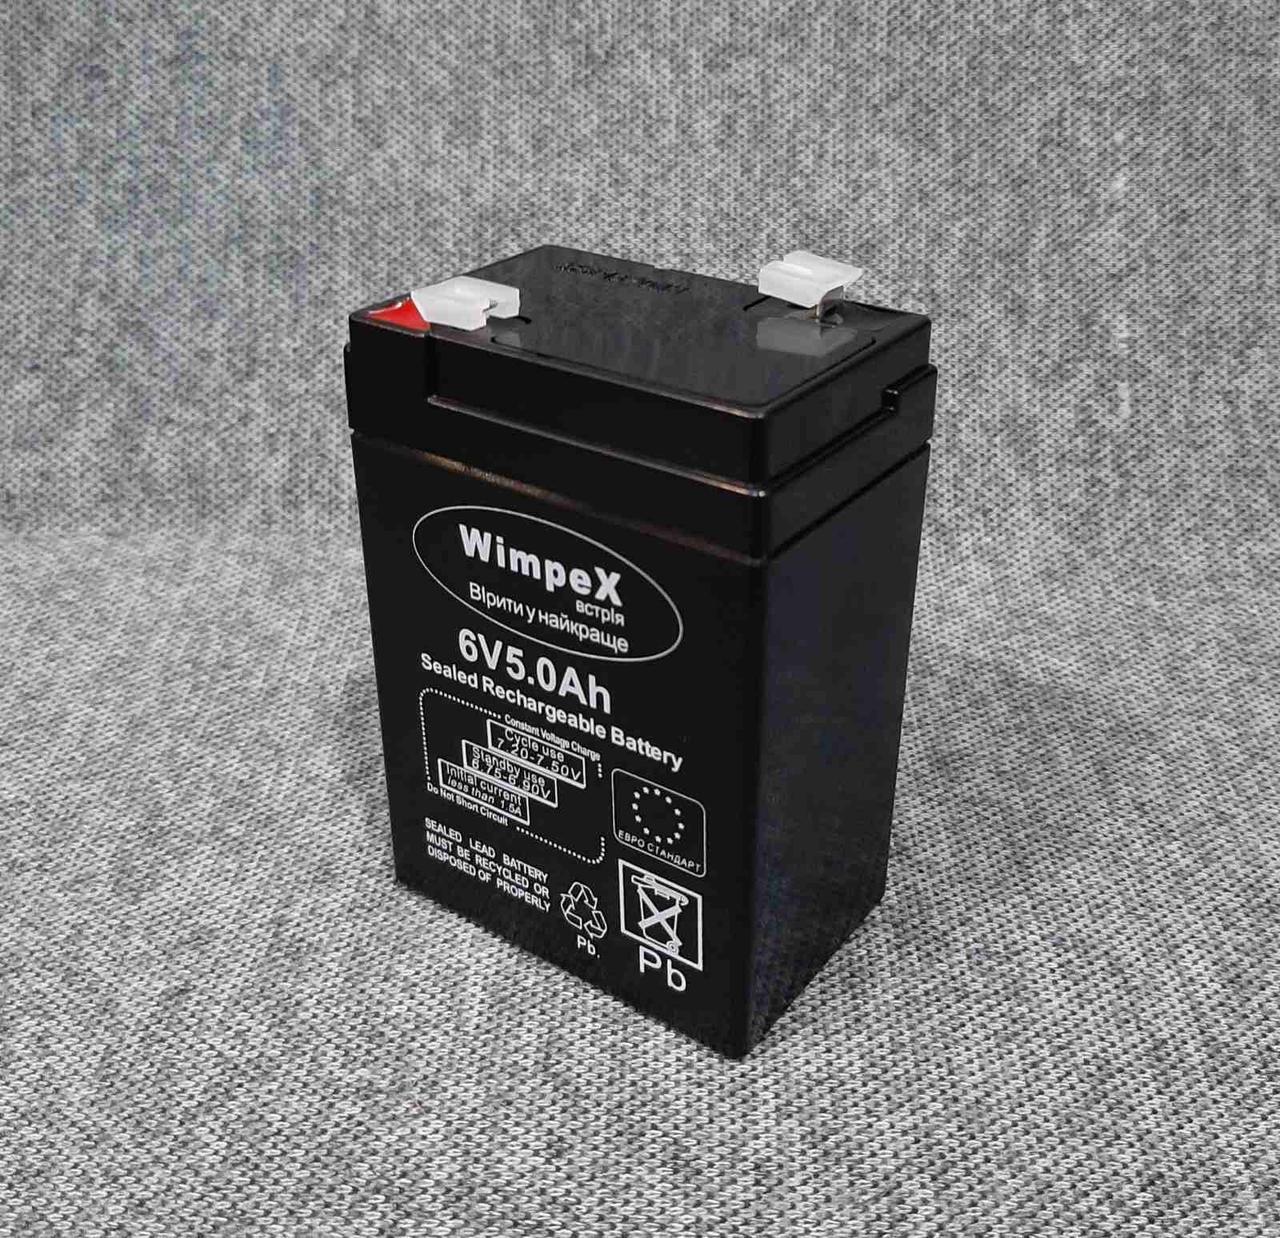 Аккумулятор wimpex 6V 5Ah